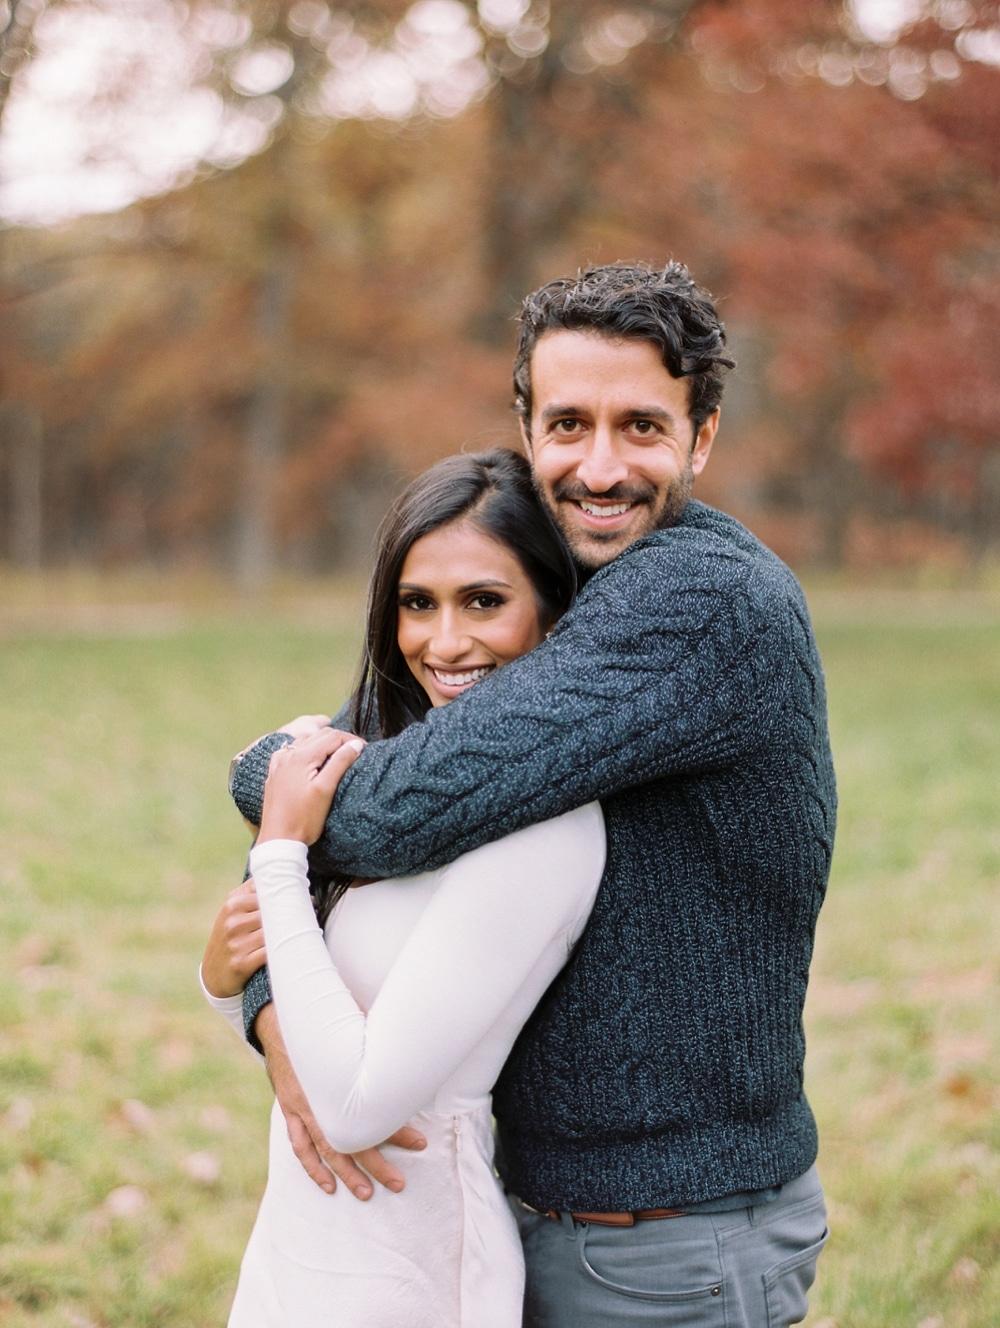 Kristin-La-Voie-Photography-morton-arboretum-chicago-wedding-photographer-116